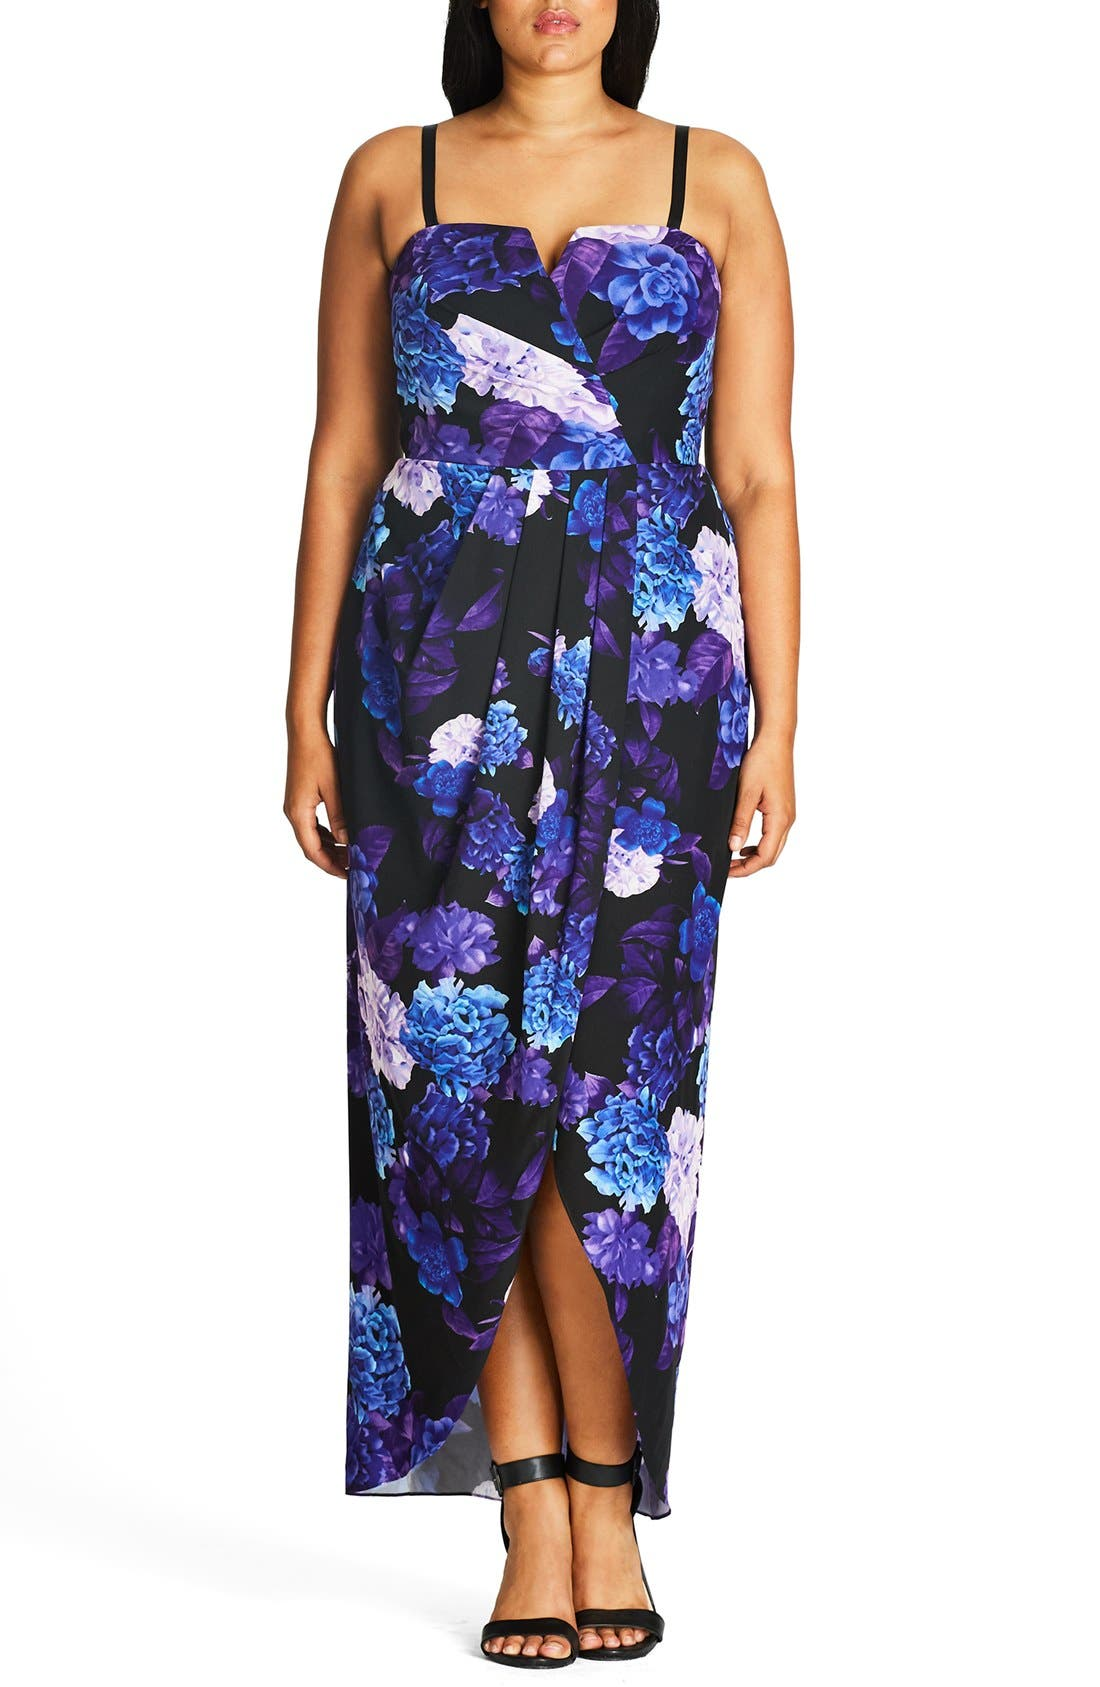 CITY CHIC, Hydrangea Print Maxi Dress, Main thumbnail 1, color, BLACK